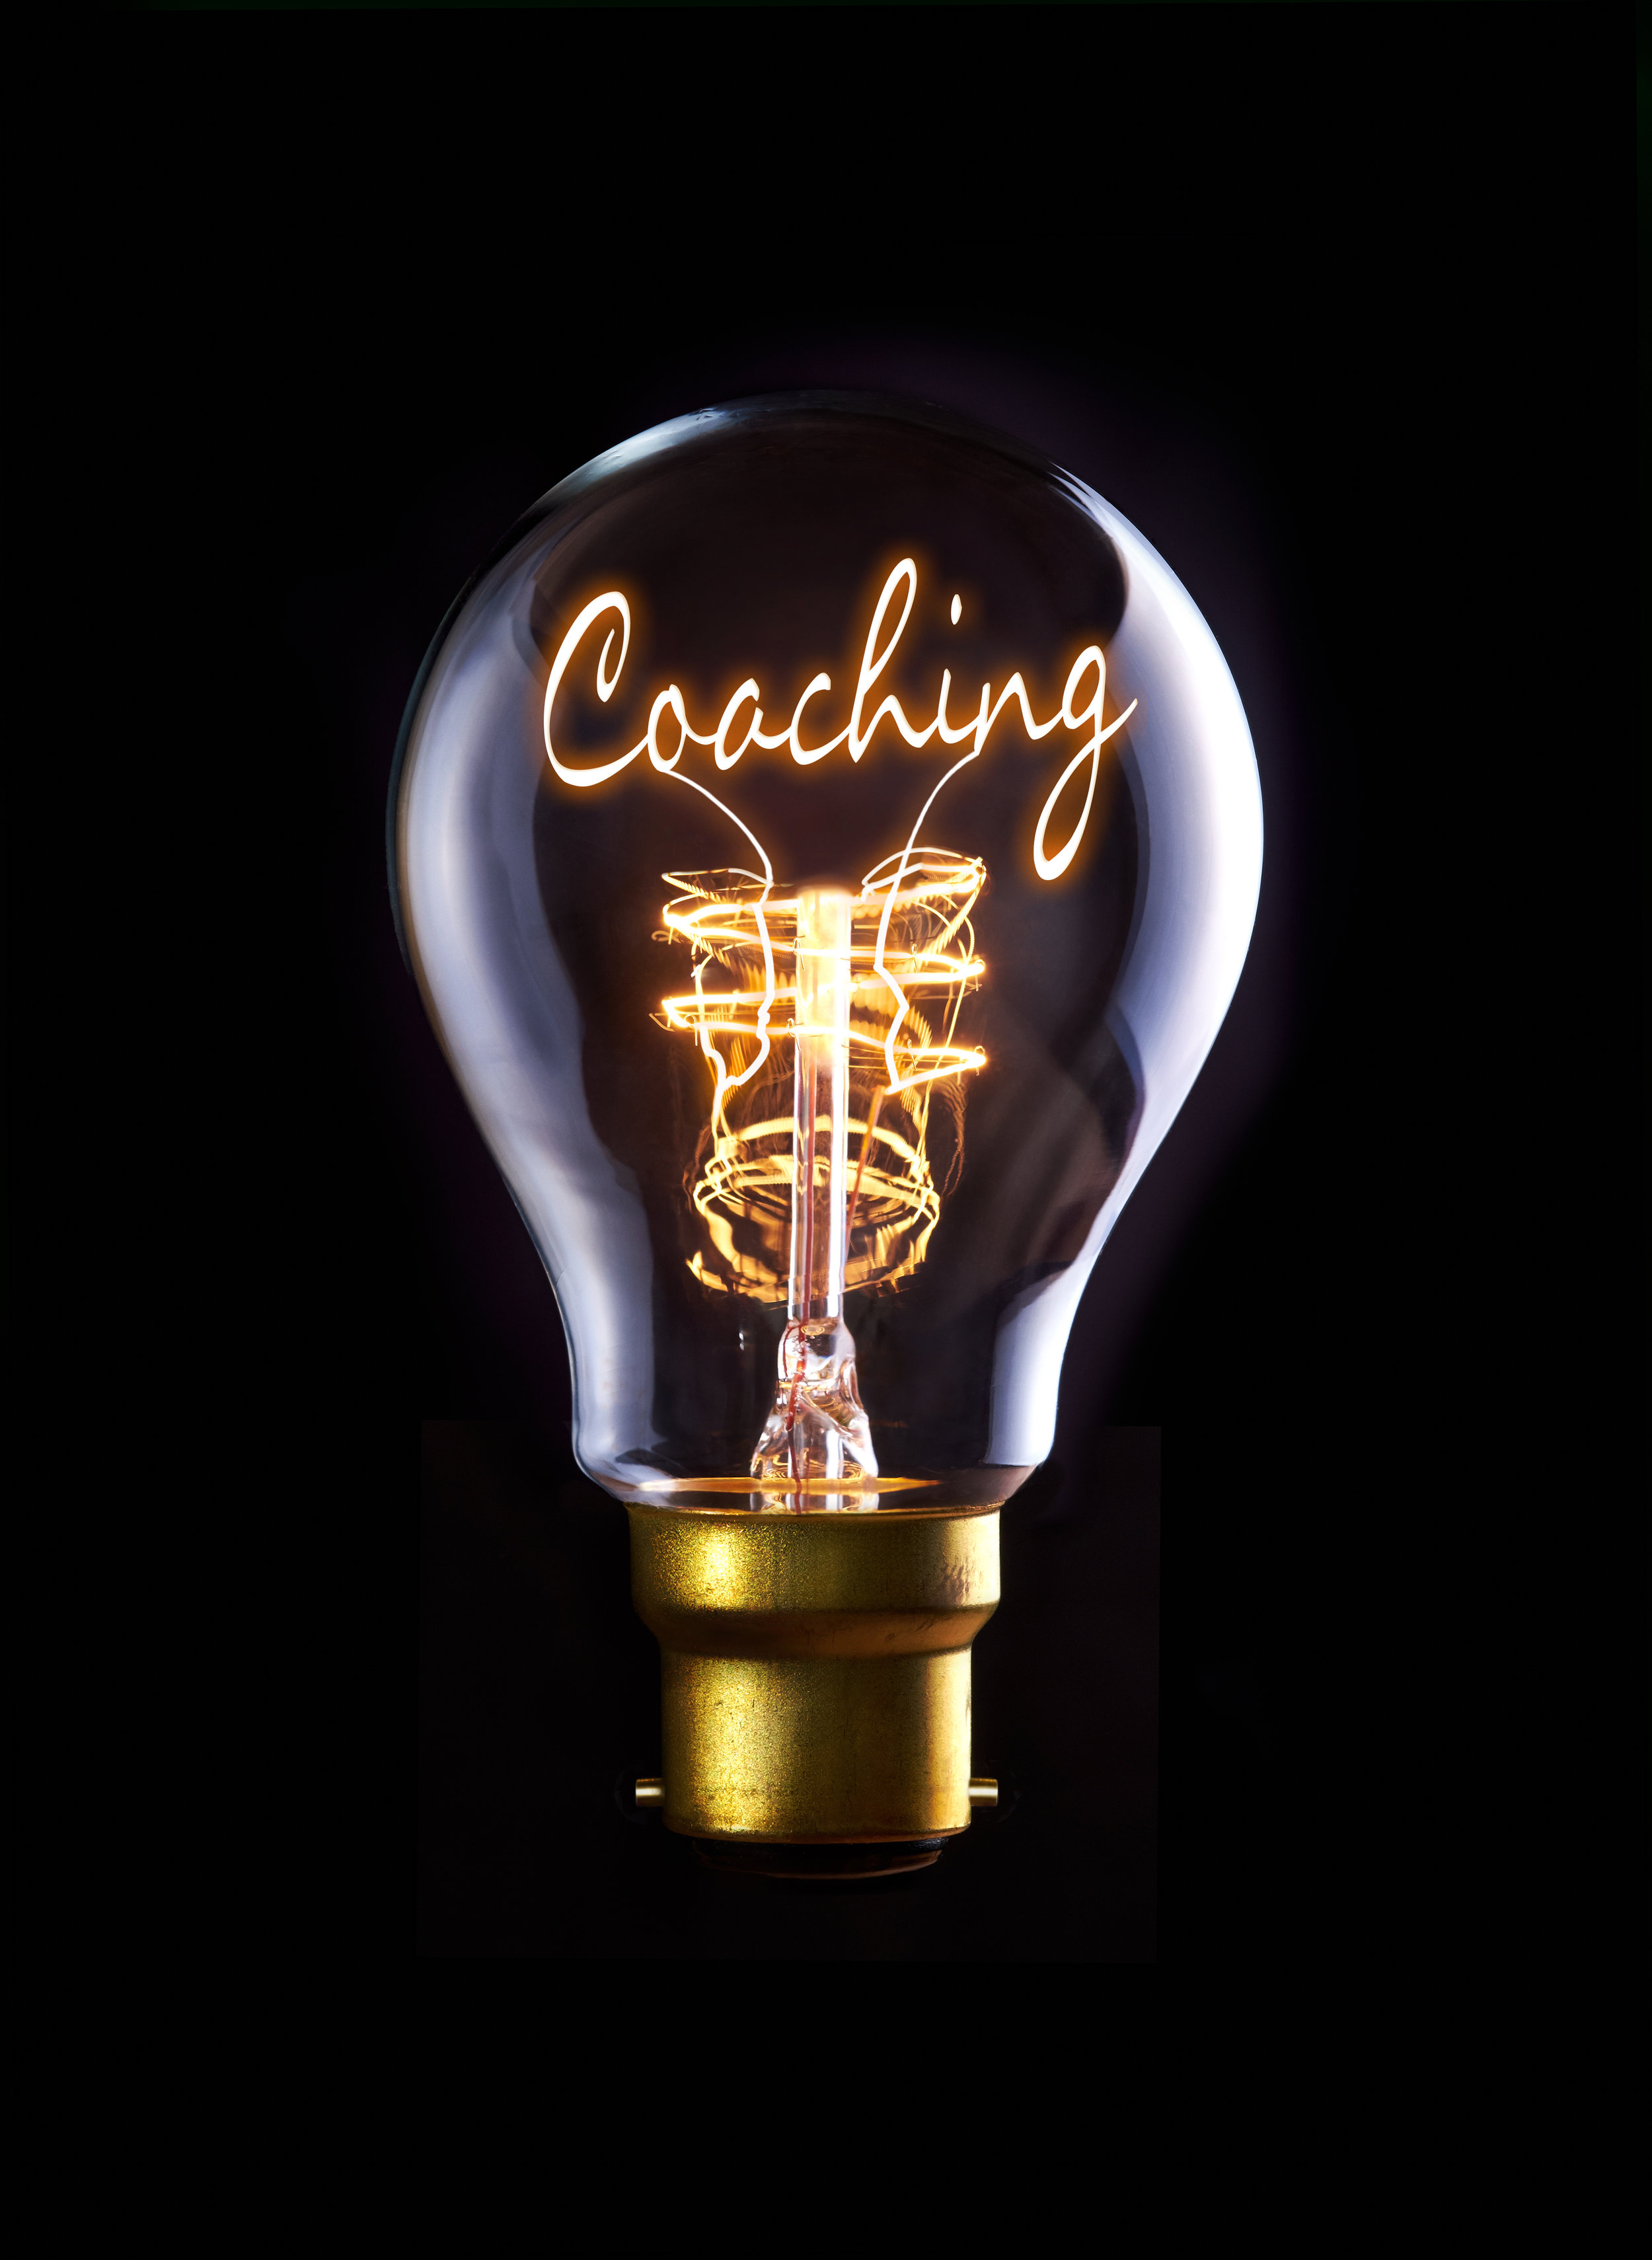 Why Teacher Coaching? -